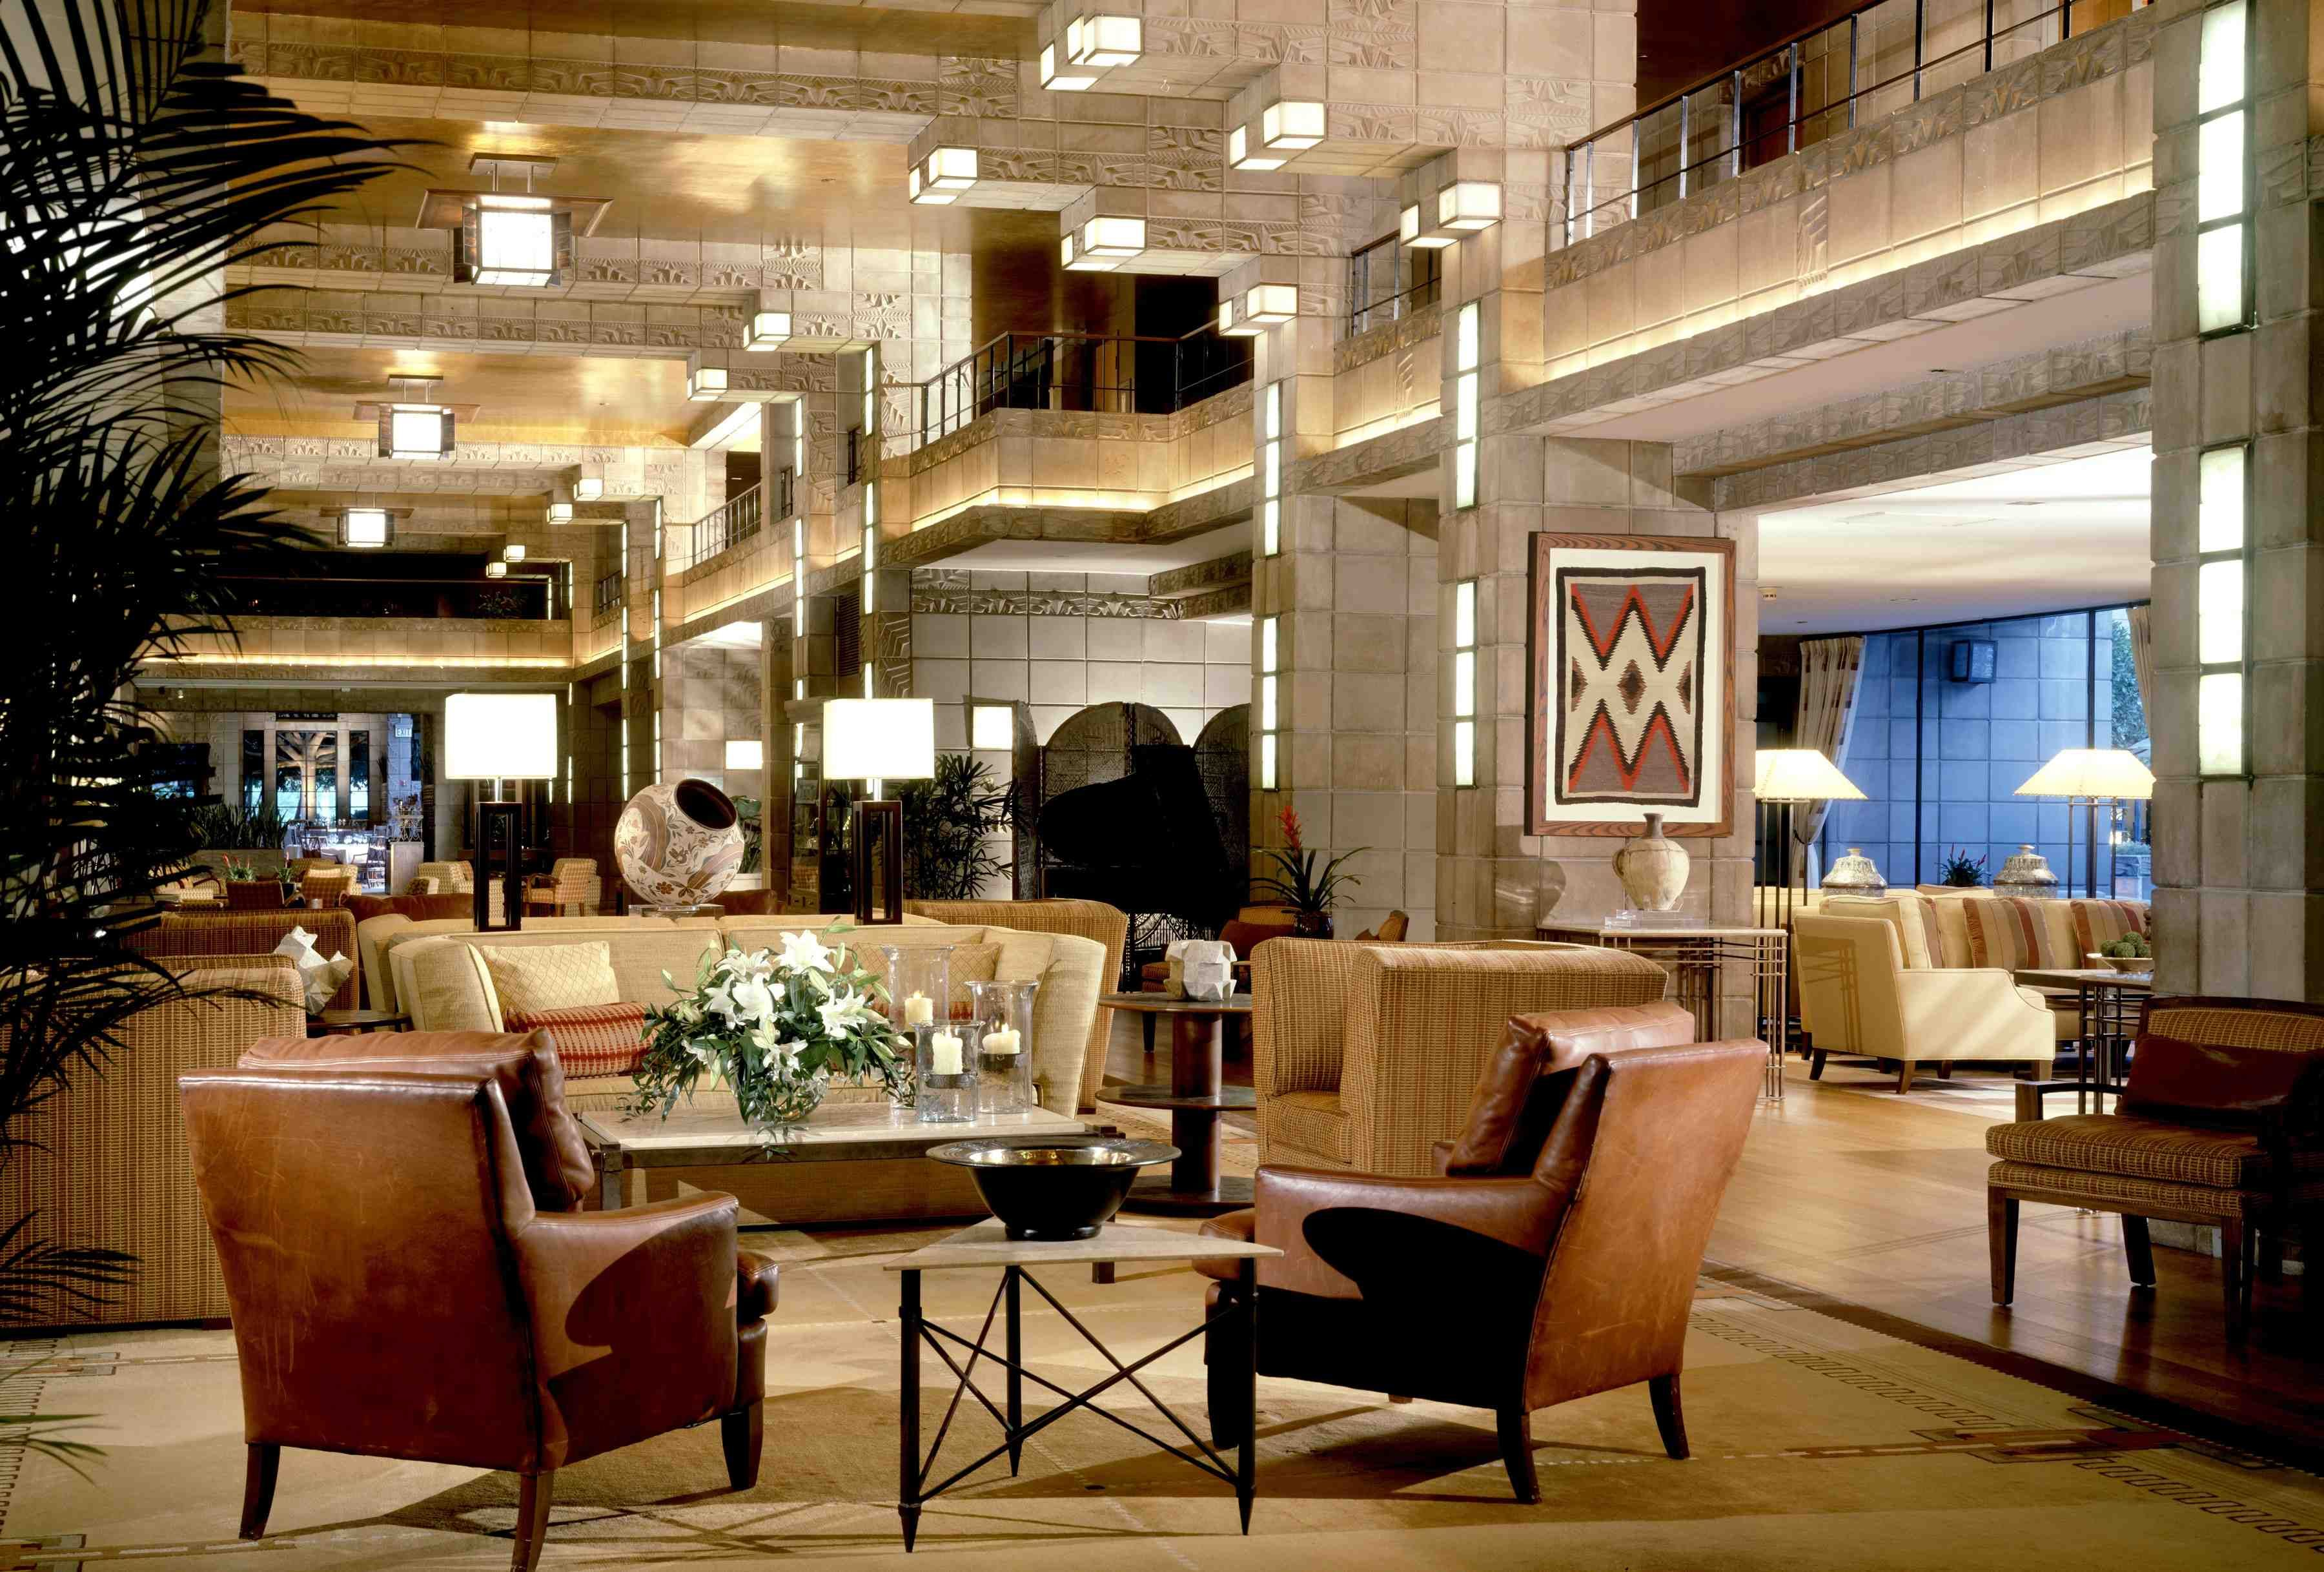 Arizona Biltmore Hotel Lobby By Frank Lloyd Wright